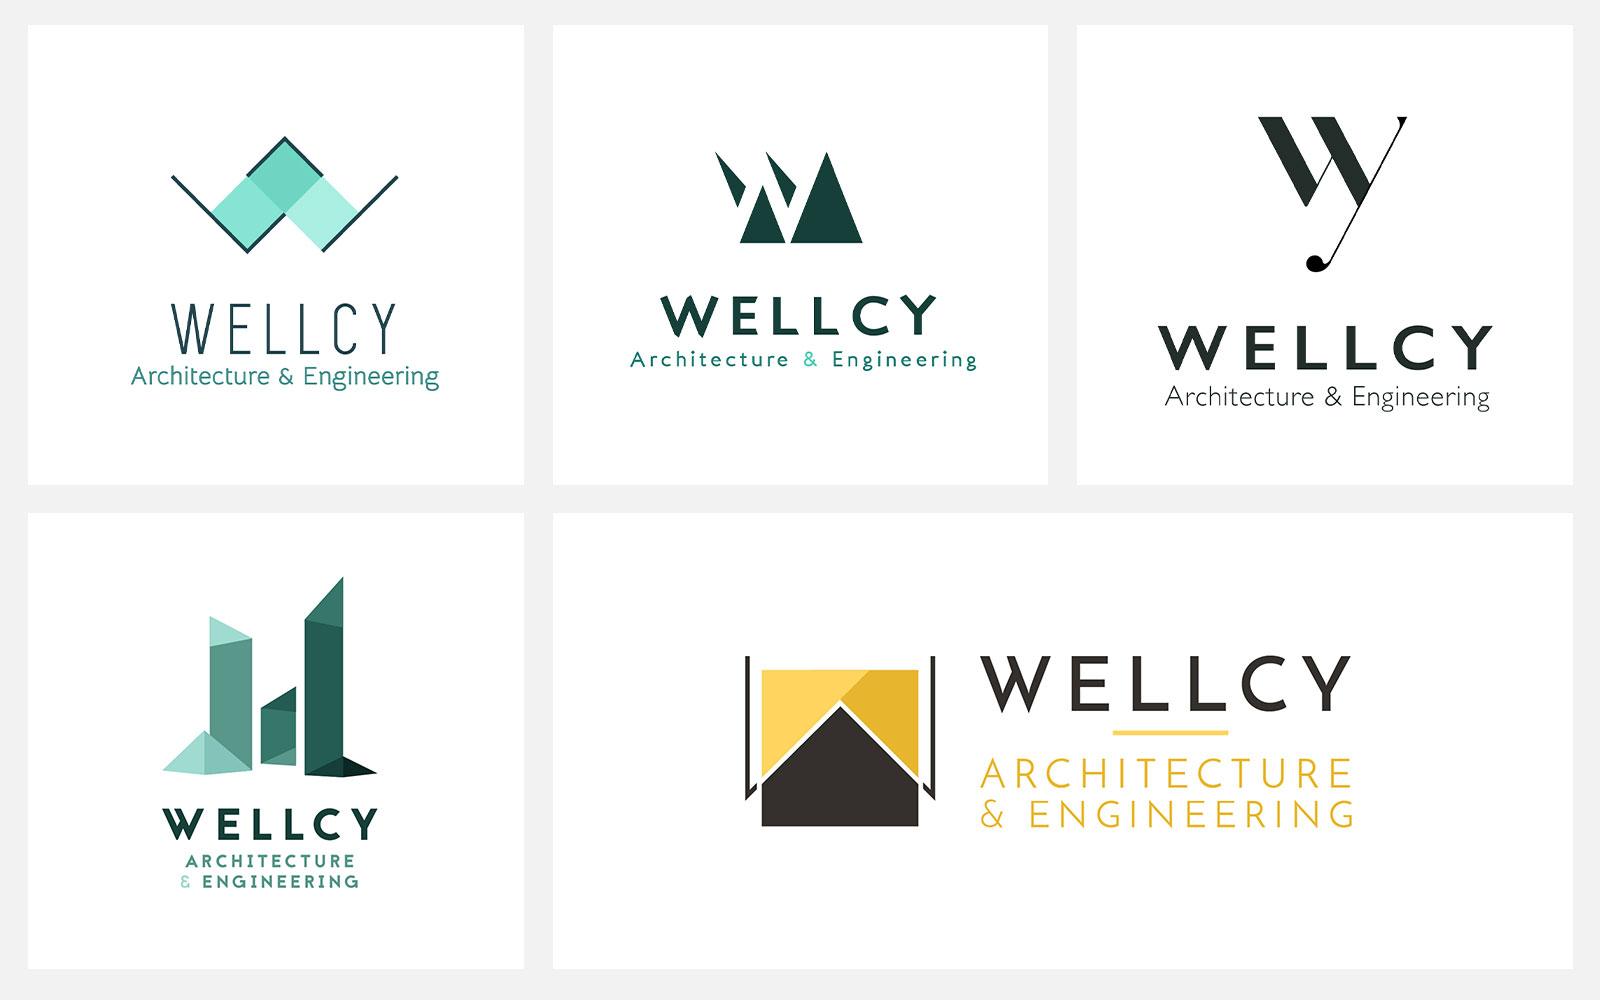 BL-Graphics - Wellcy - propositions de logos